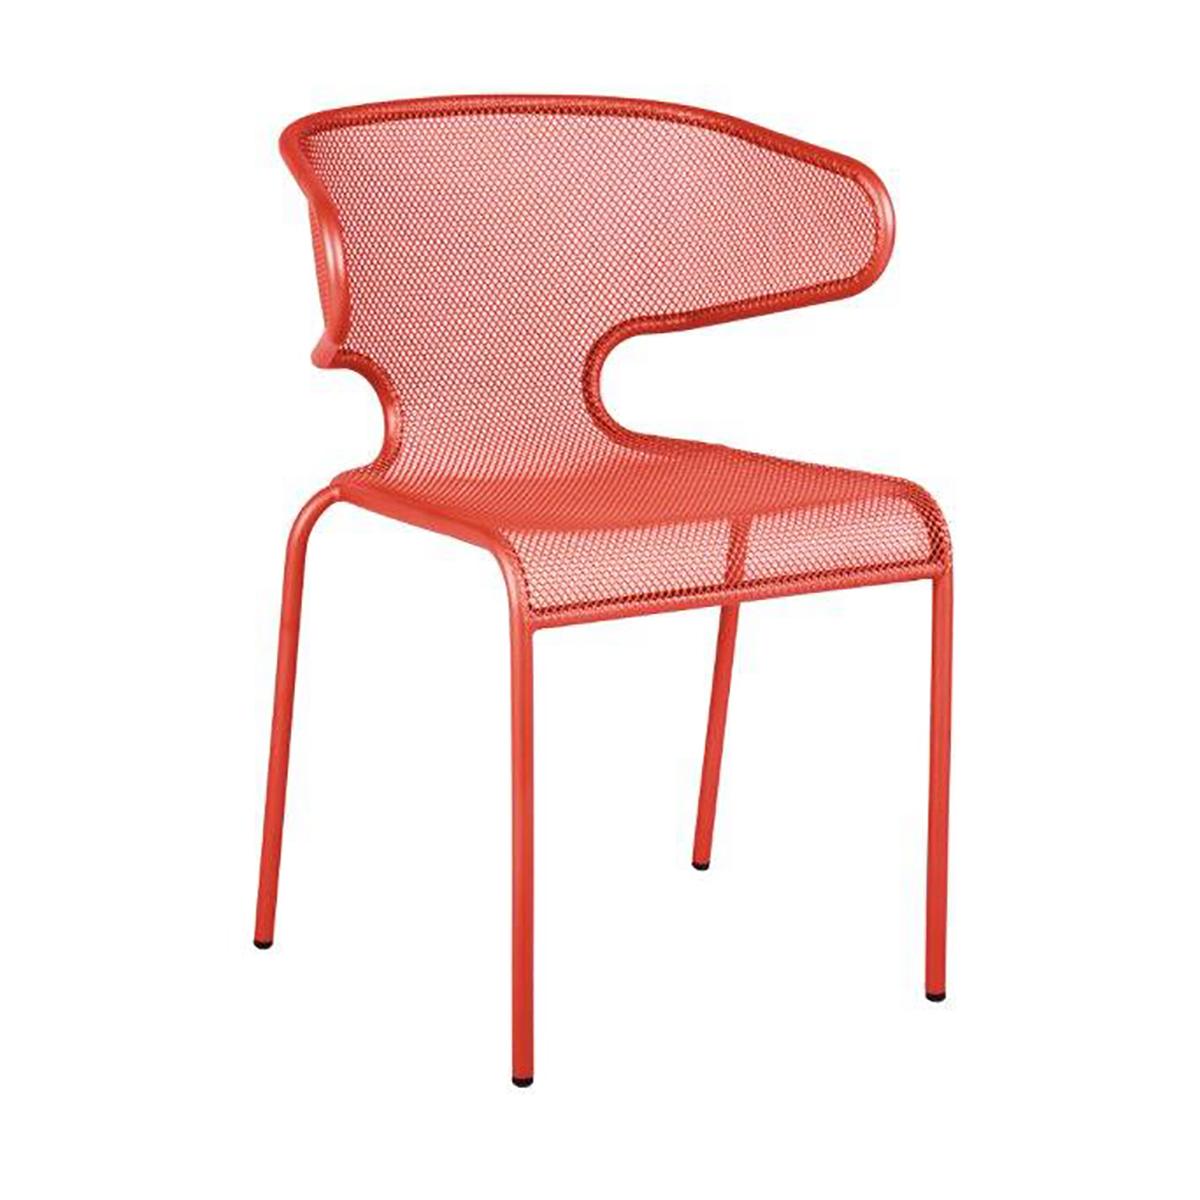 grenadine mesh outdoor chair